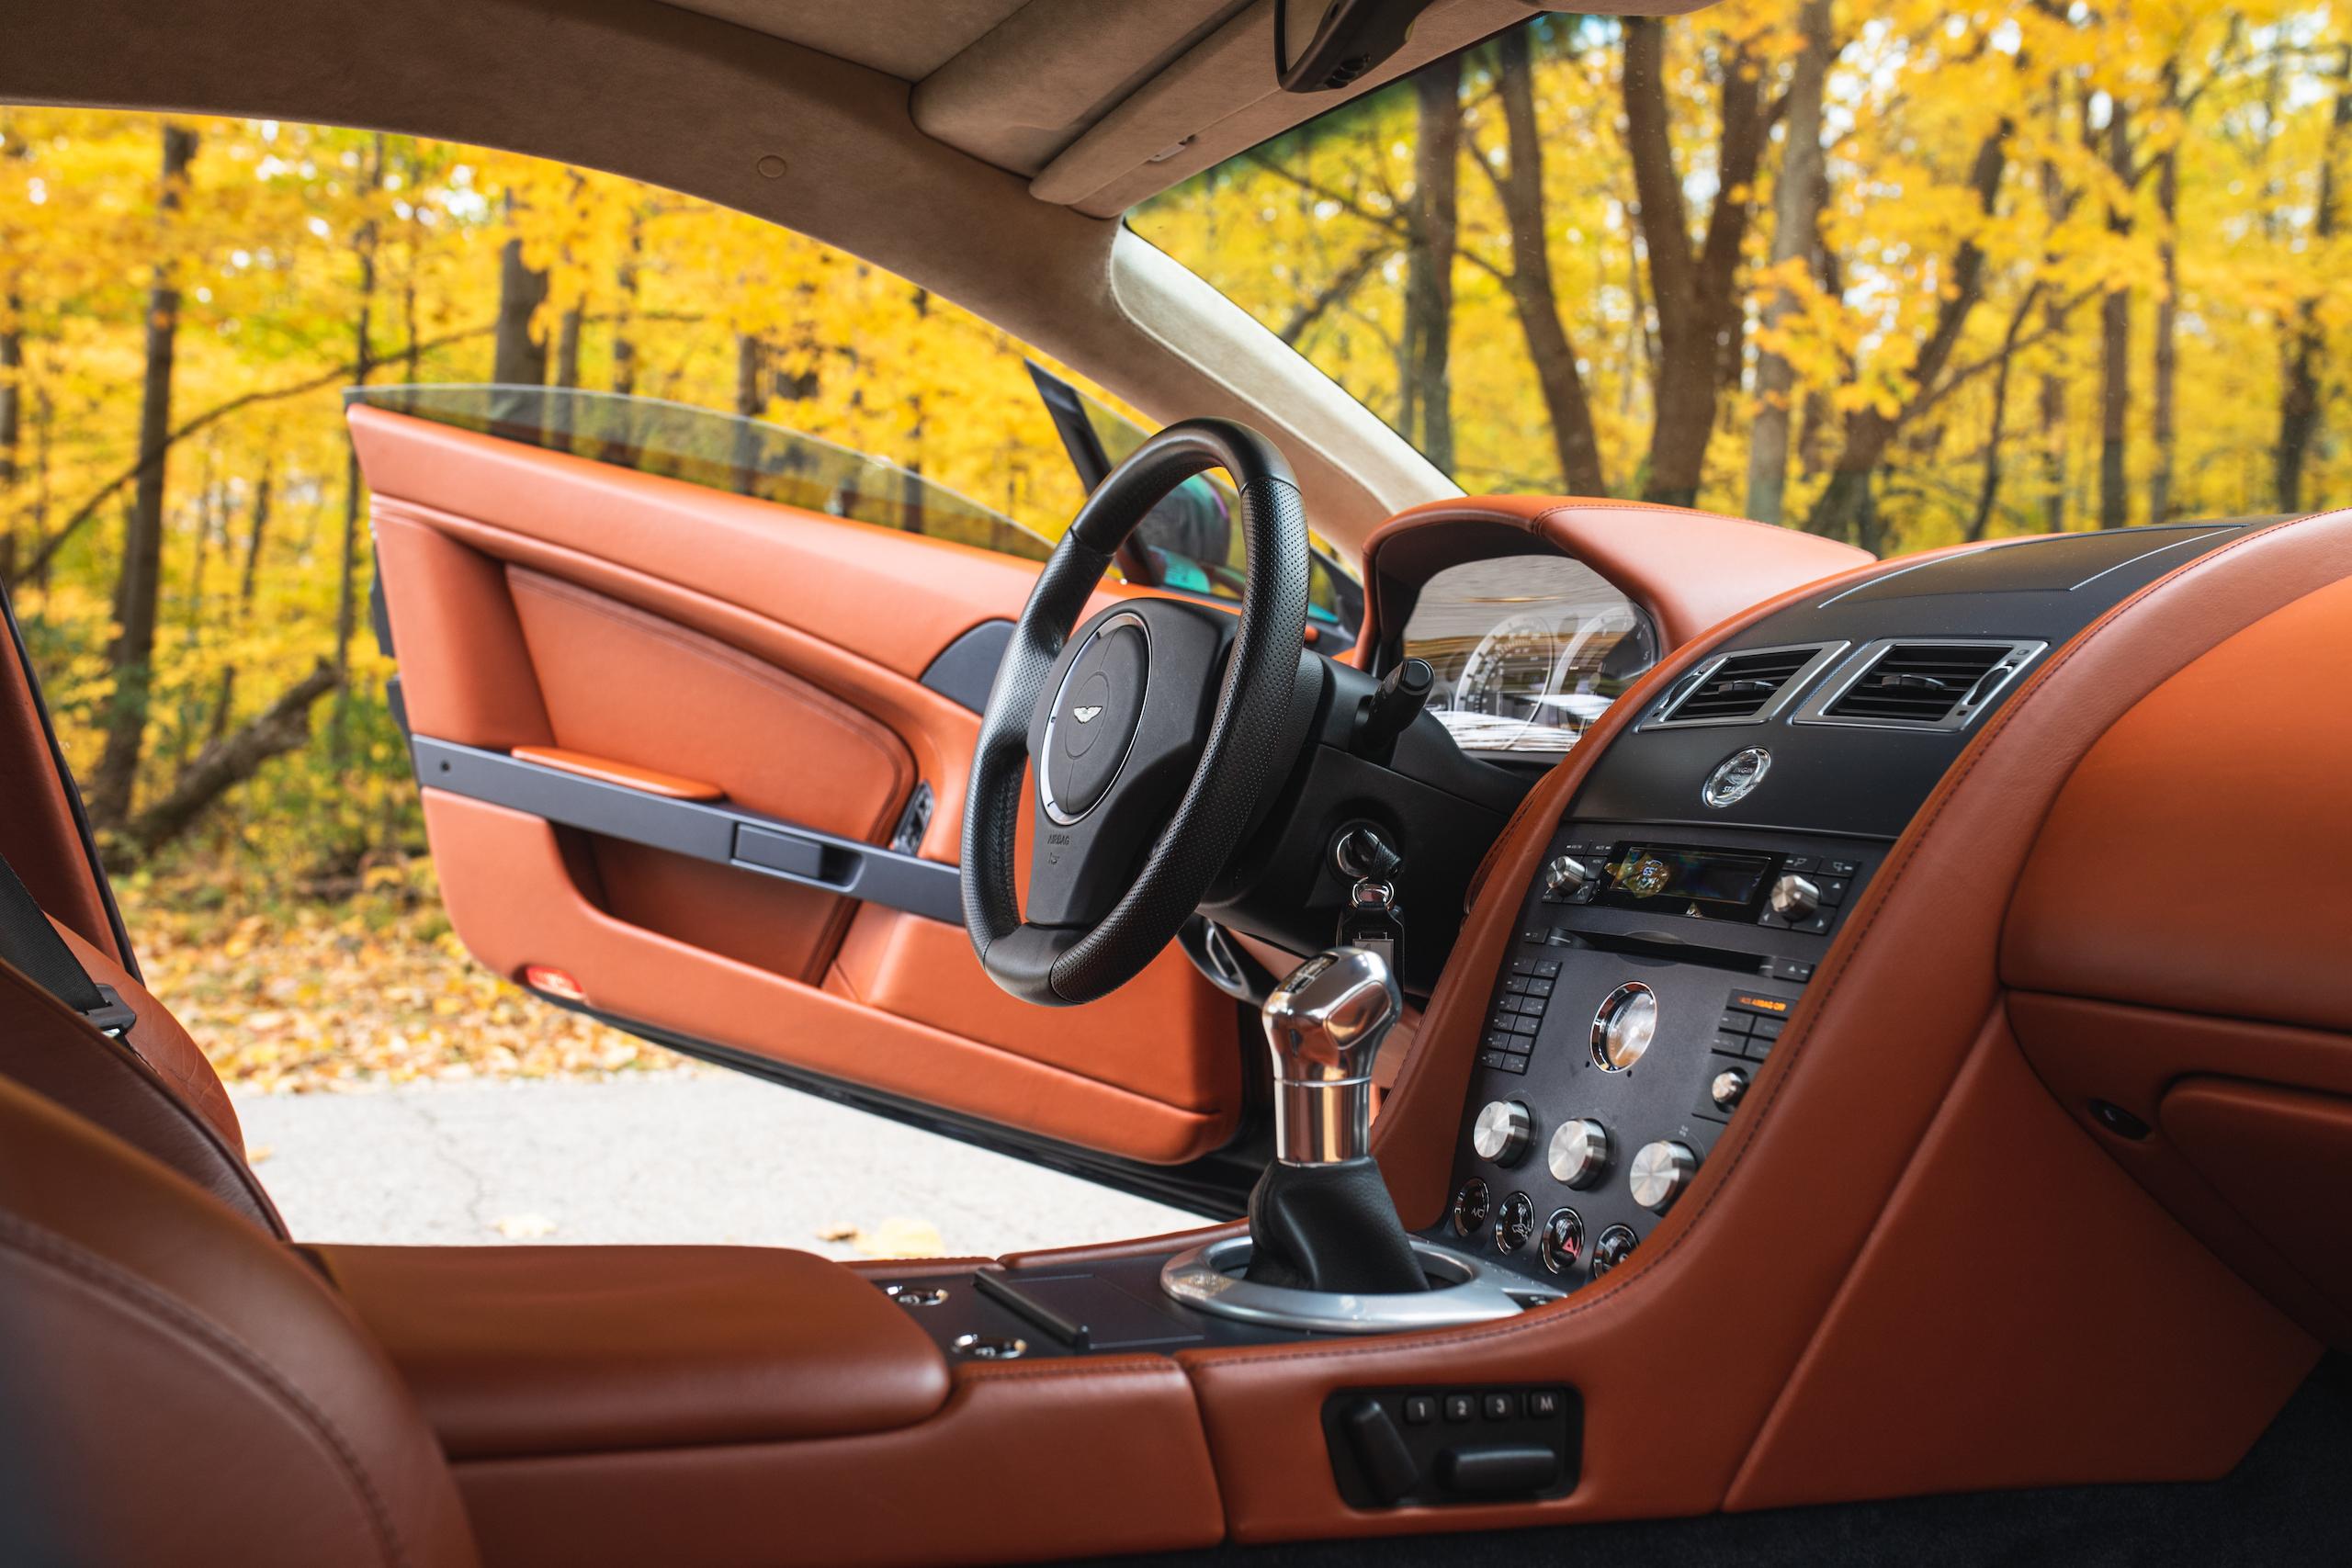 2007 Aston Martin Vantage V8 interior angle